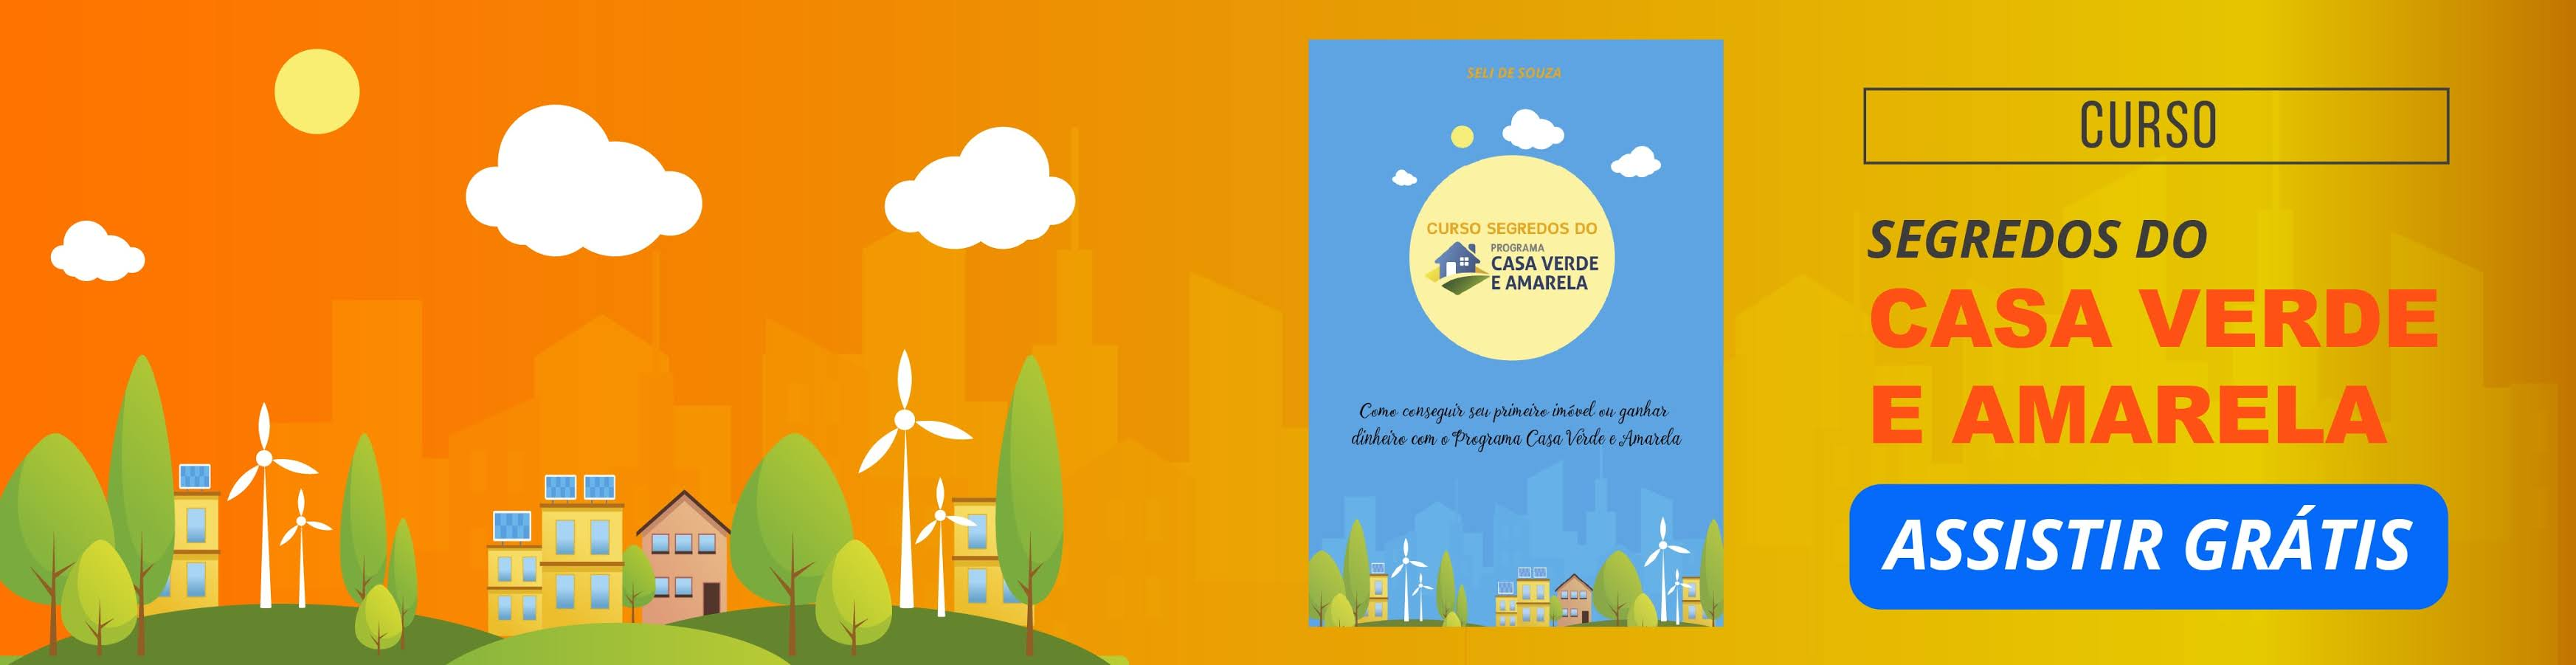 Curso Segredos do Programa Casa Verde e Amarela